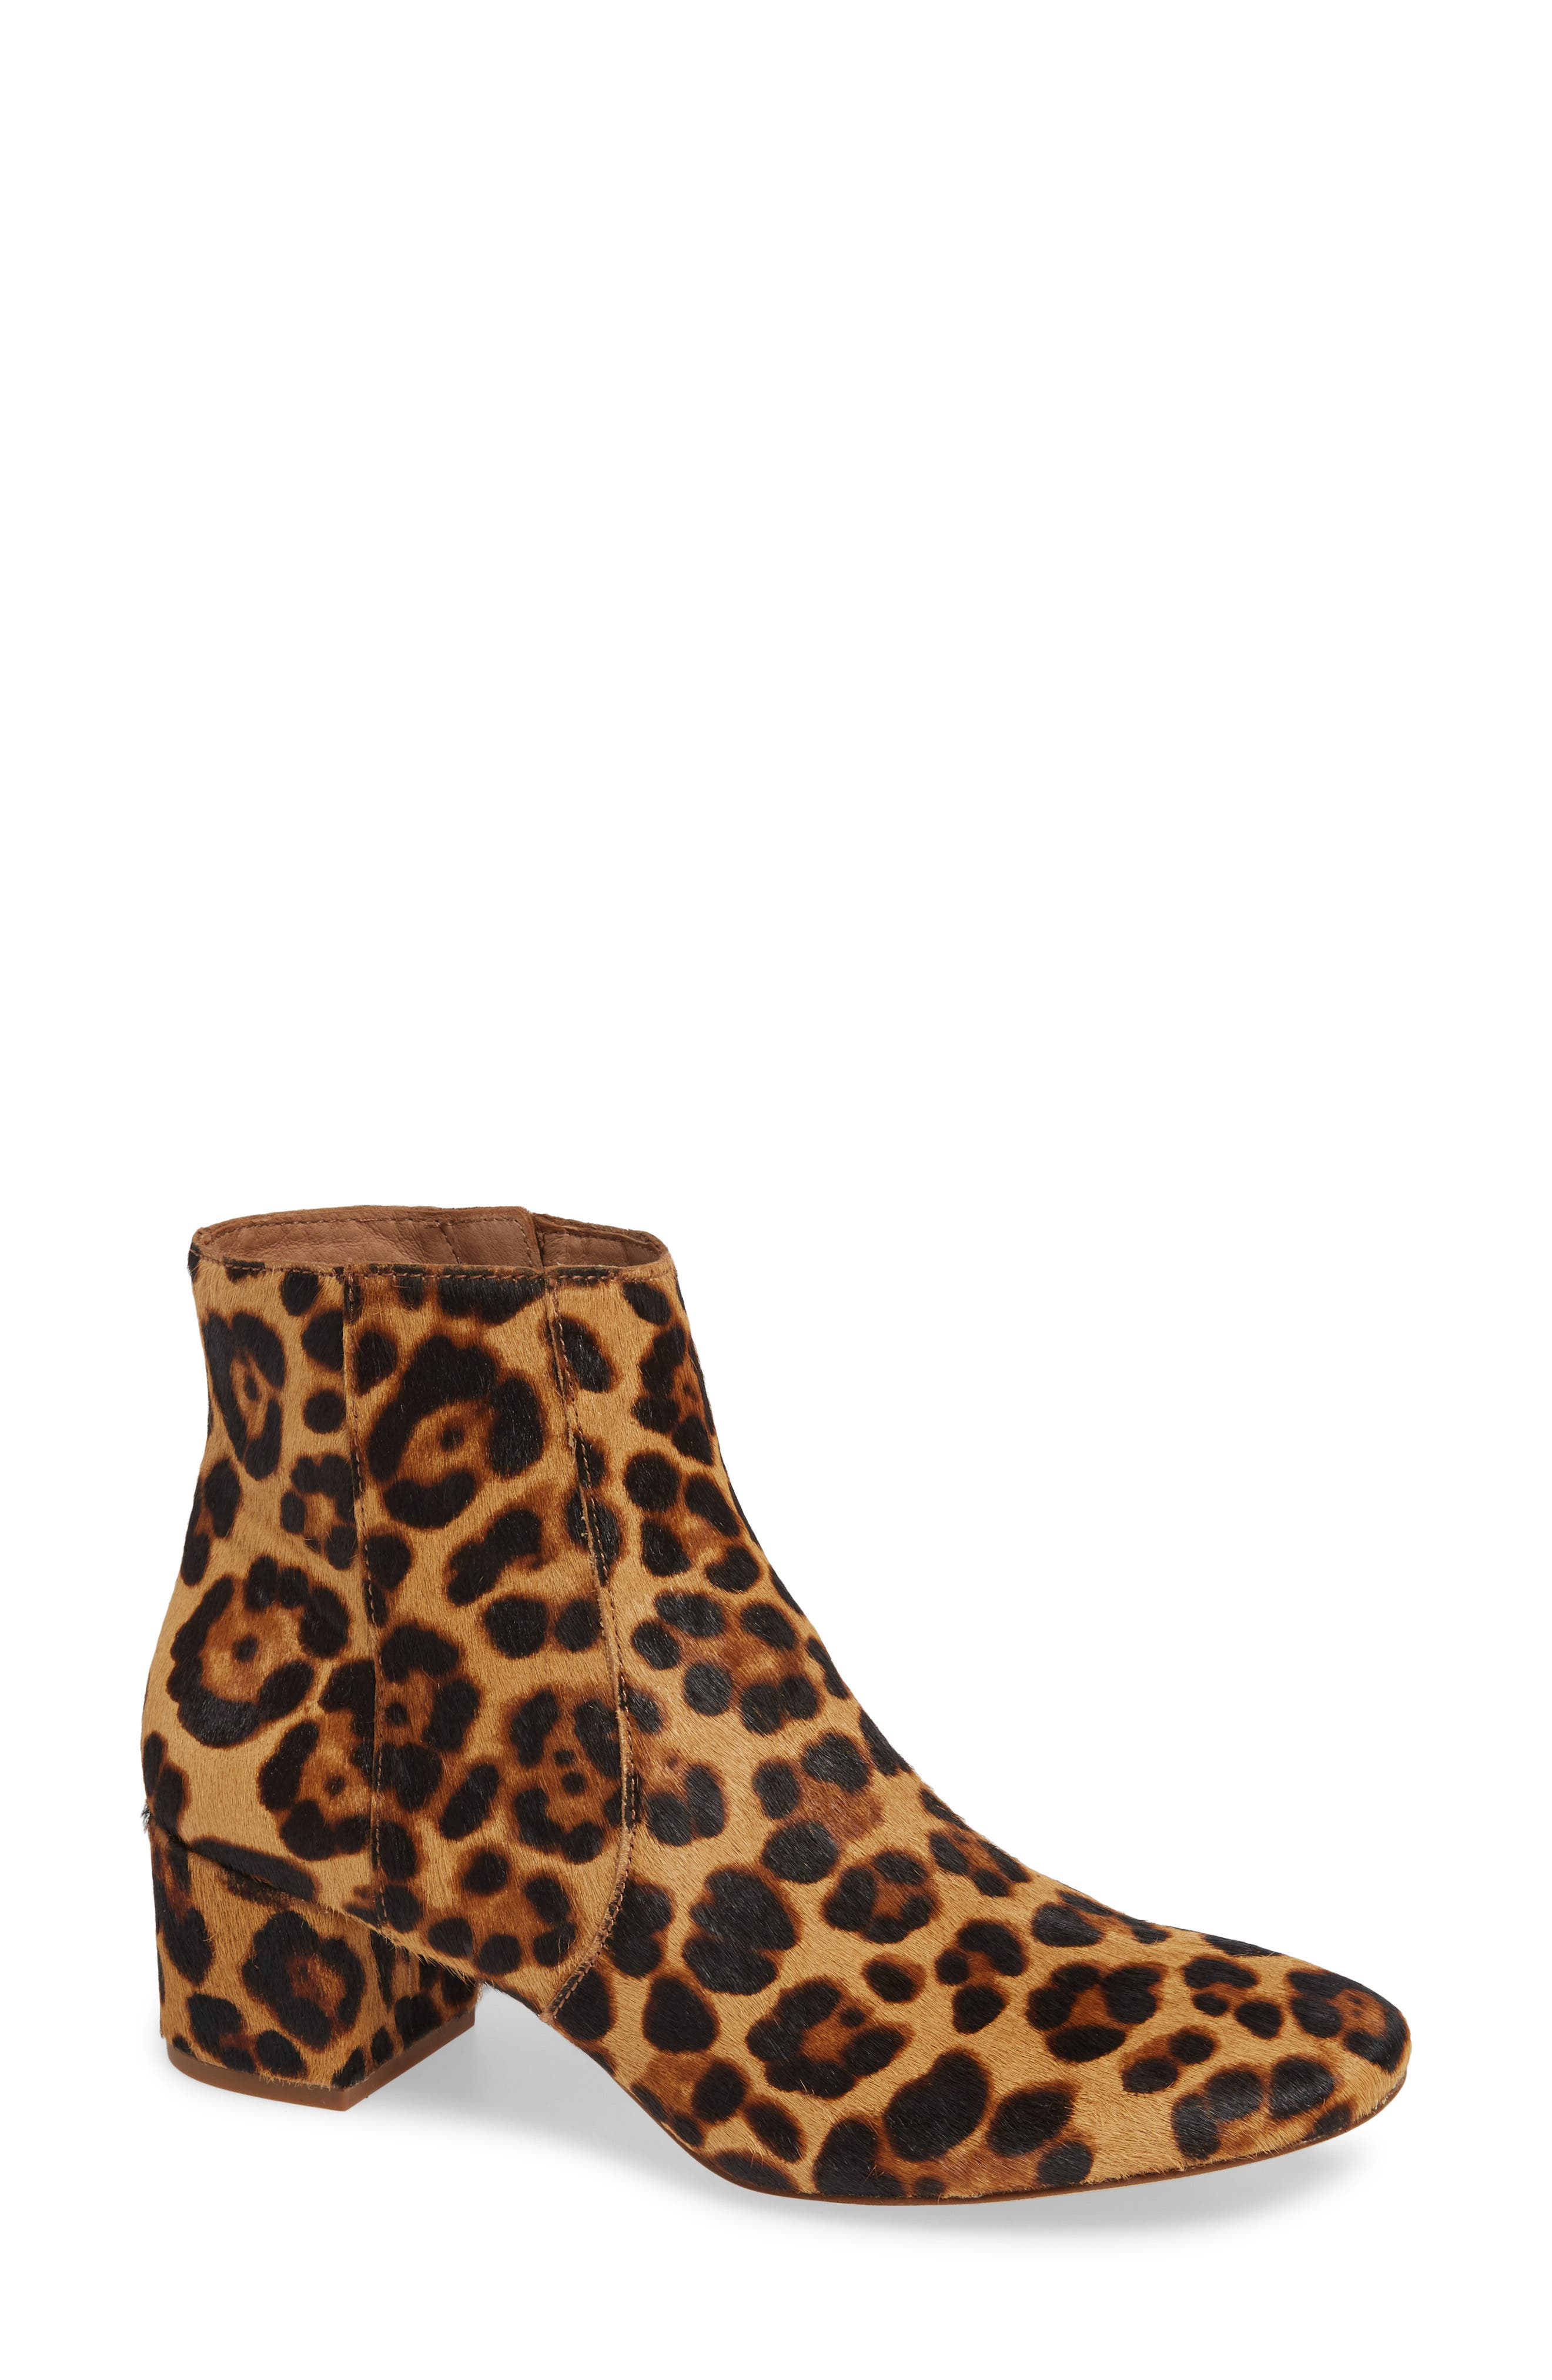 MADEWELL The Jada Genuine Calf Hair Boot, Main, color, 200